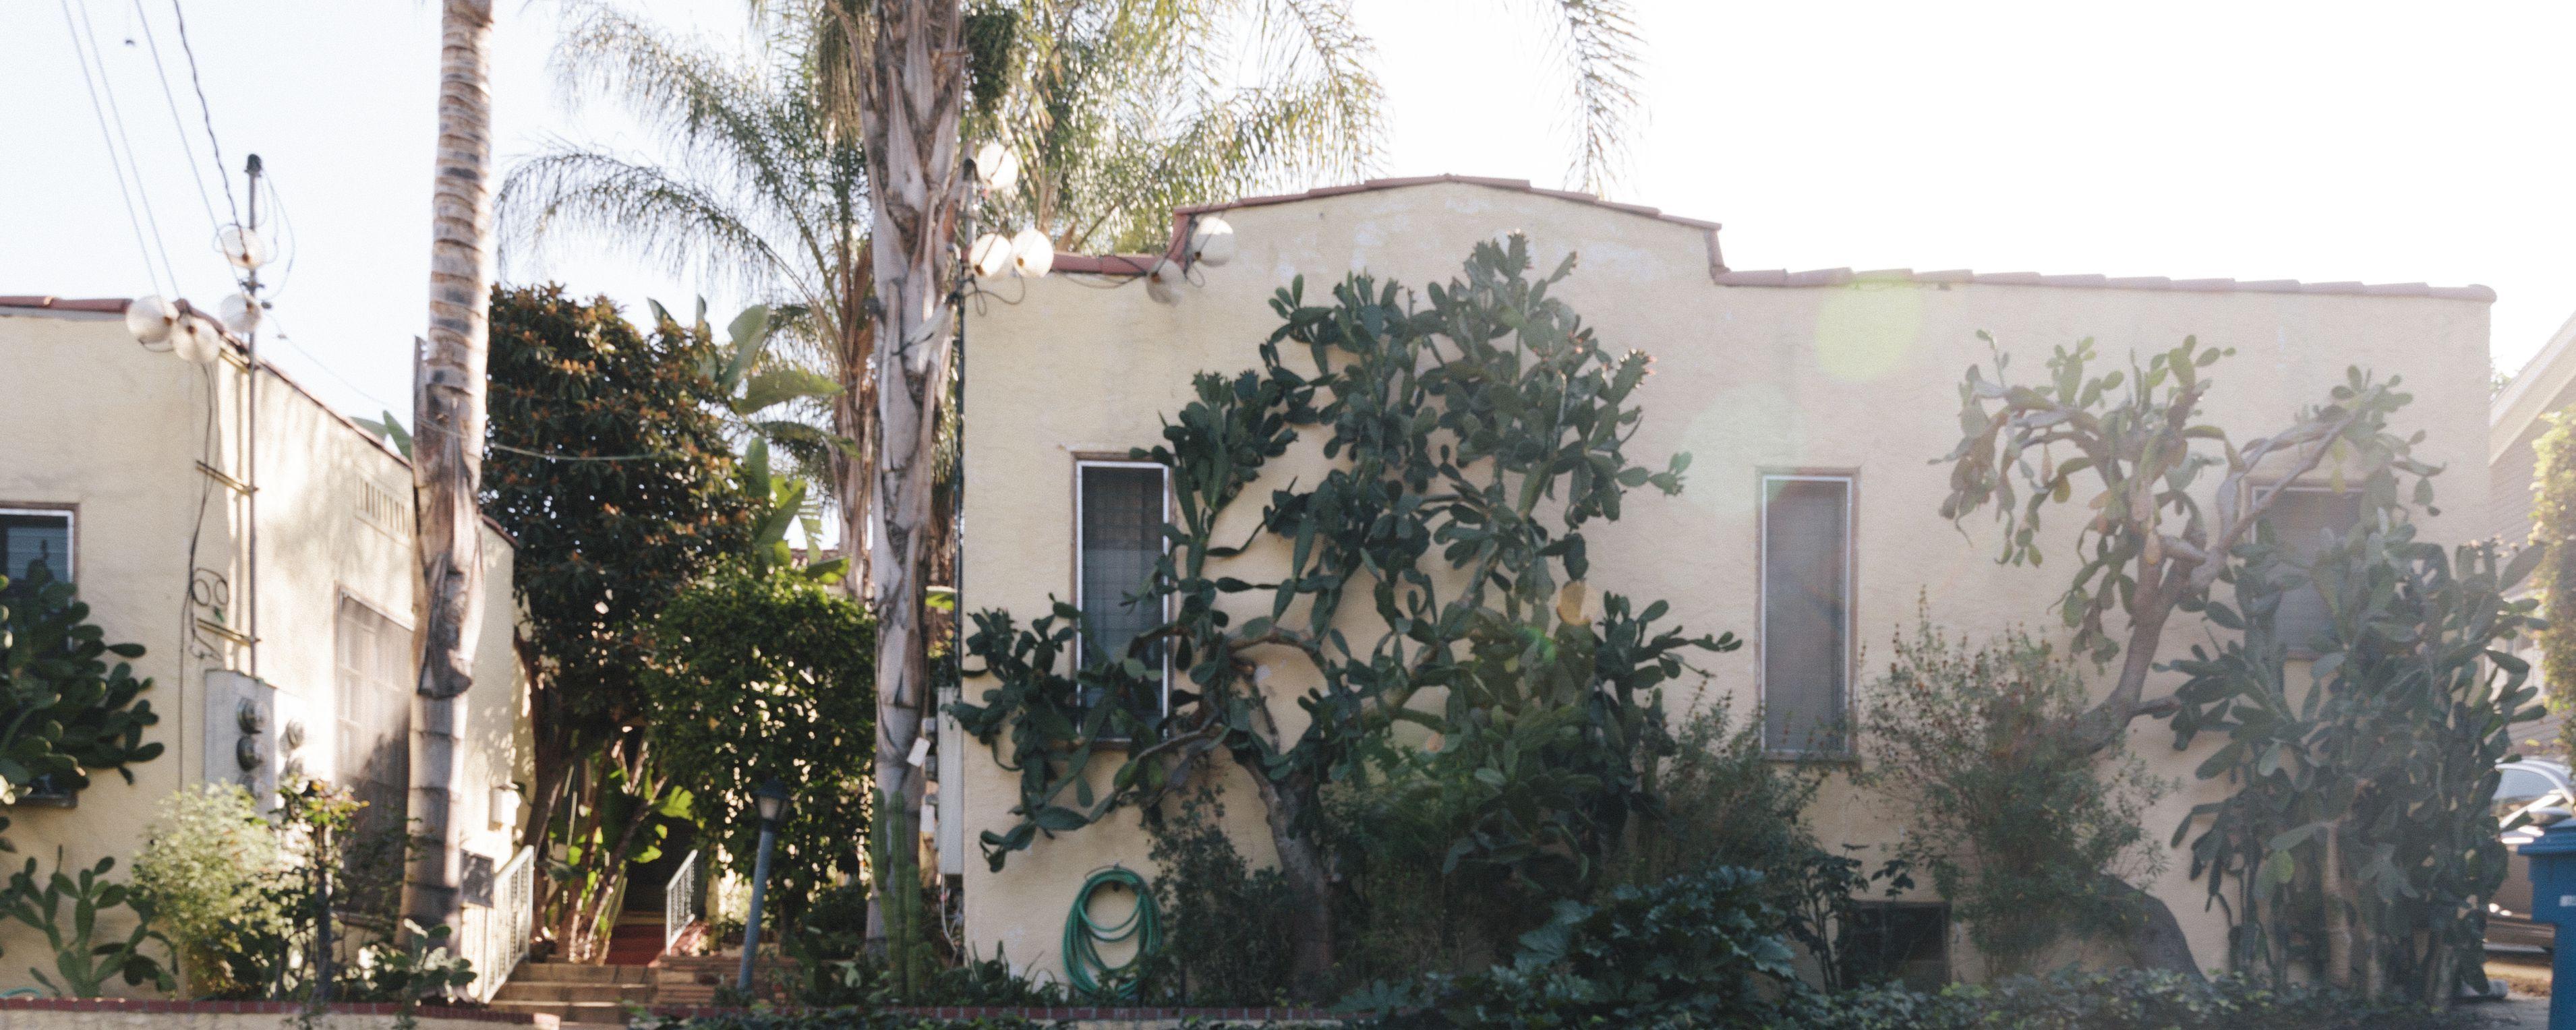 L A Places Bungalow Heaven: Why LA's Beloved Bungalow Courts Might Go Extinct (With